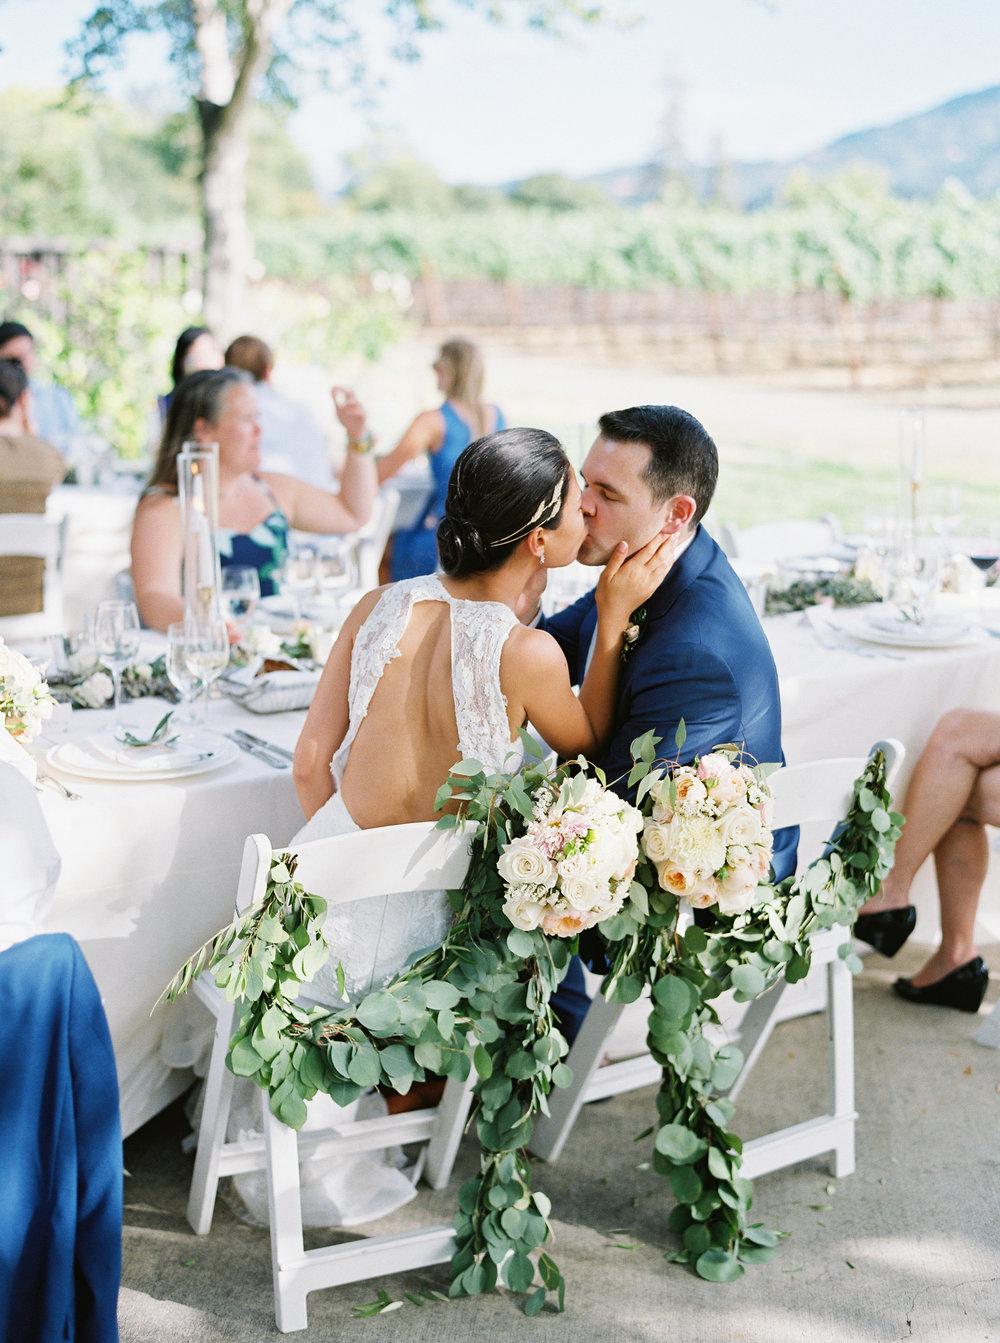 Harvest-inn-wedding-in-napa-california-64.jpg